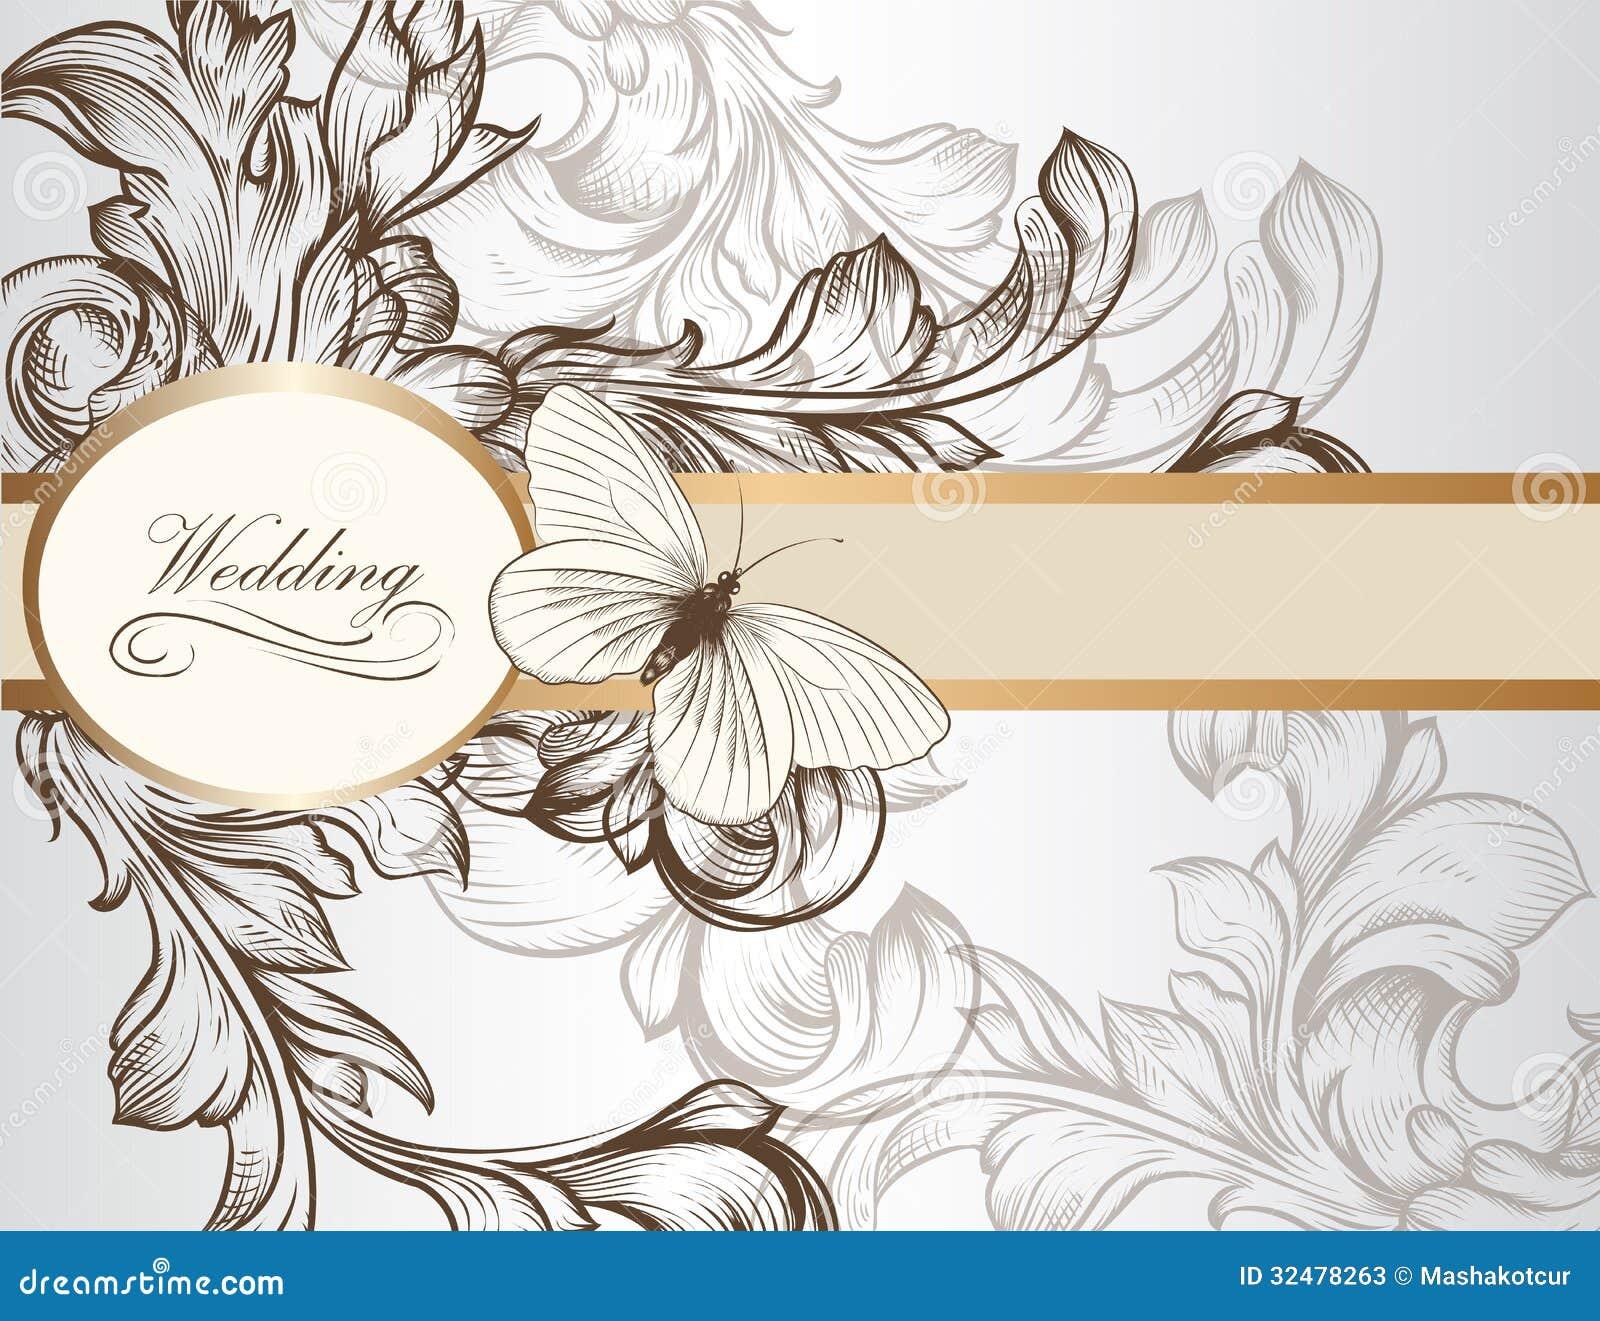 Wedding World Wedding Design